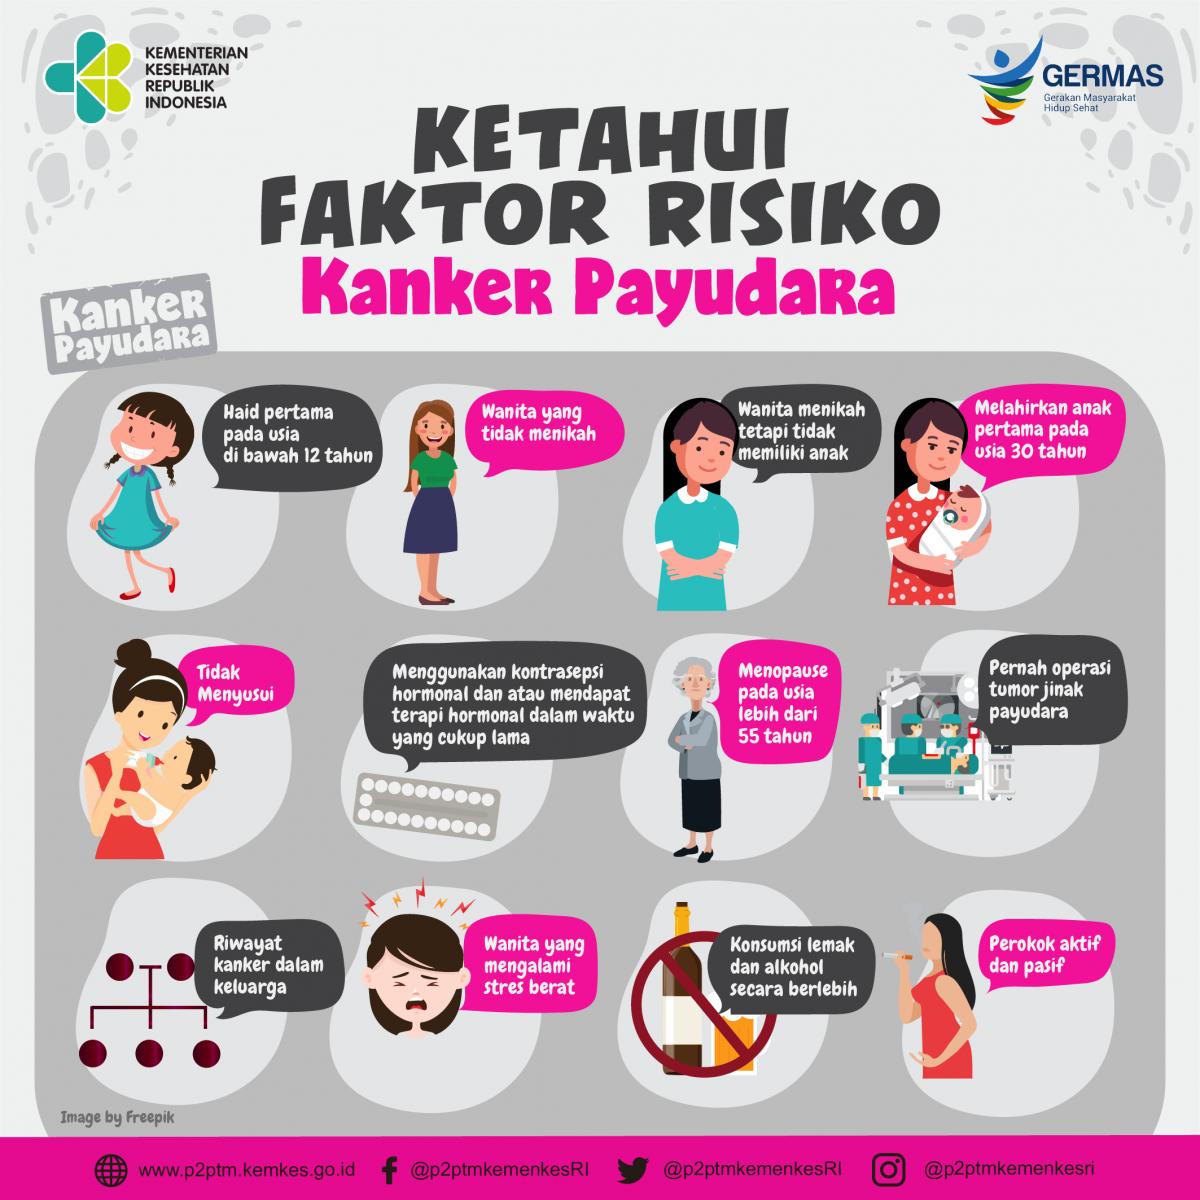 Ketahui faktor risiko penyebab kanker payudara ...